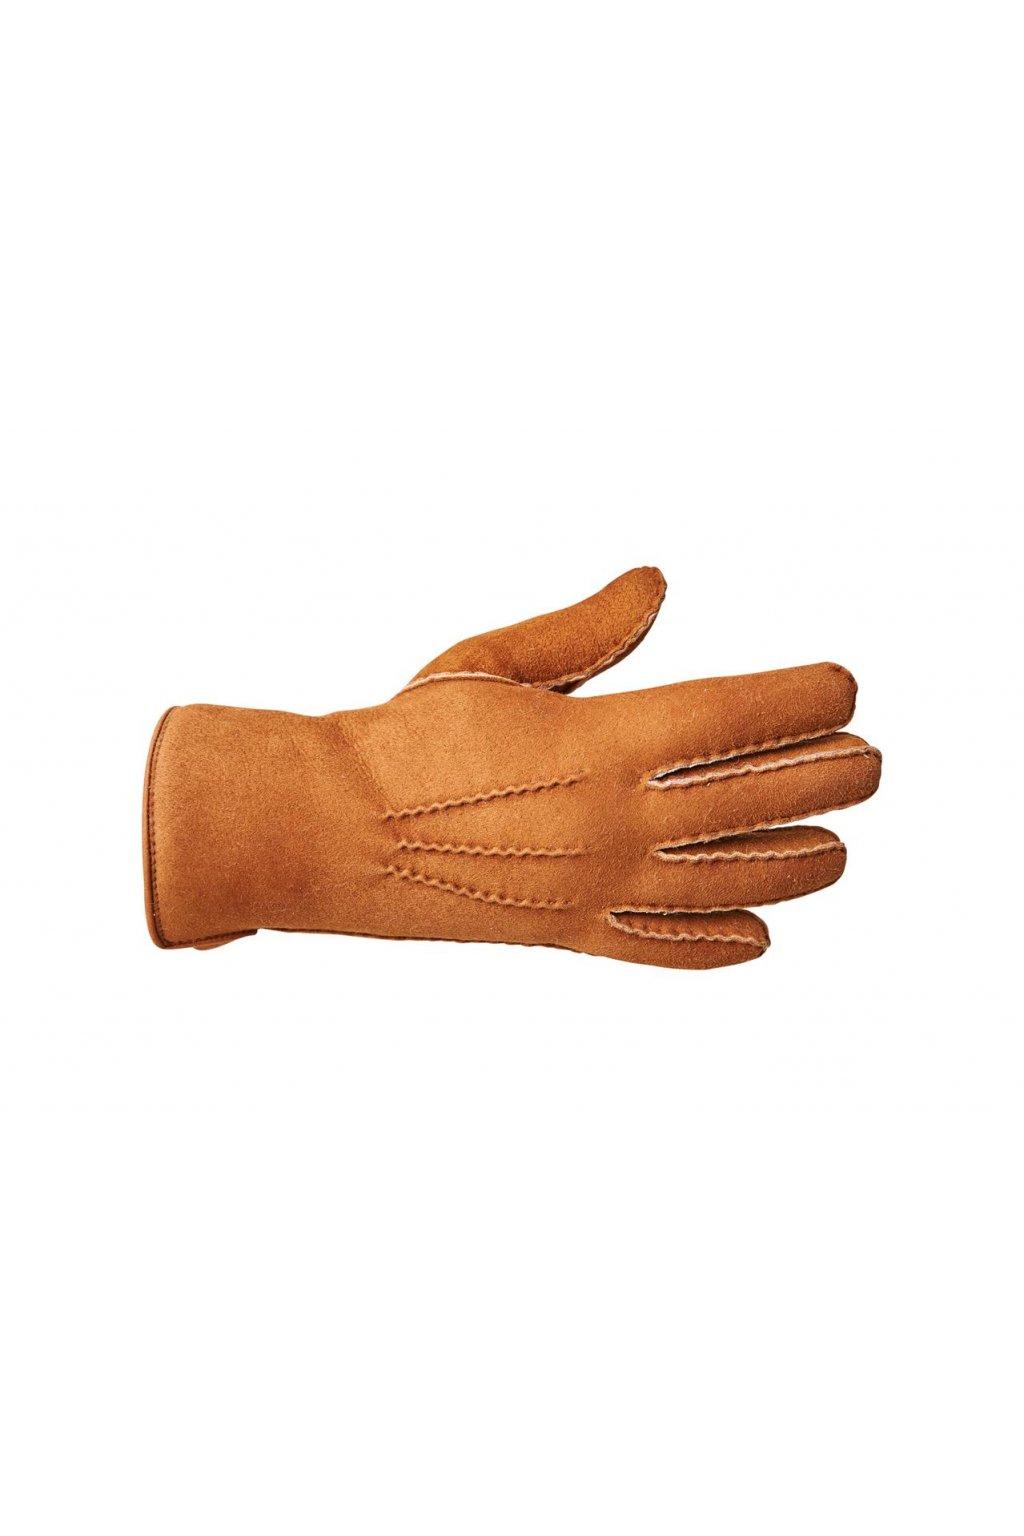 Lammfell Fingerhandschuhe für Herren cognac 0